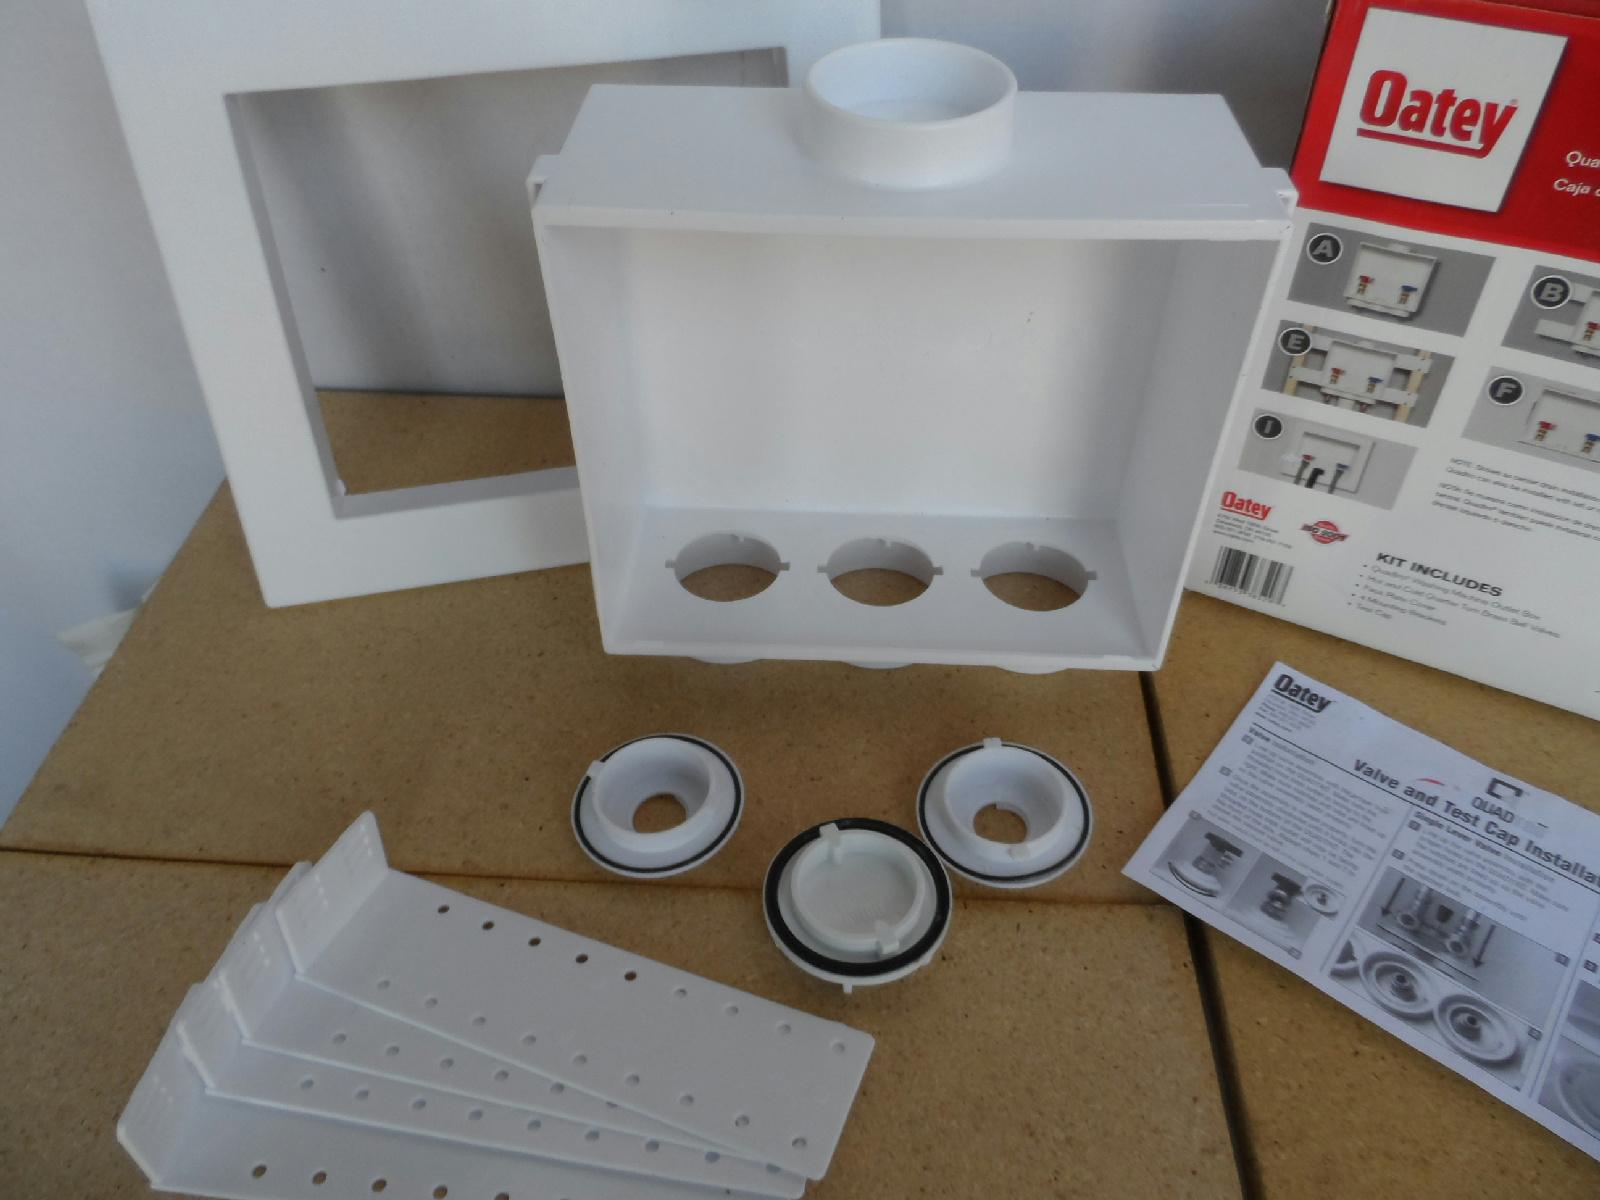 oatey quadtro washing machine box